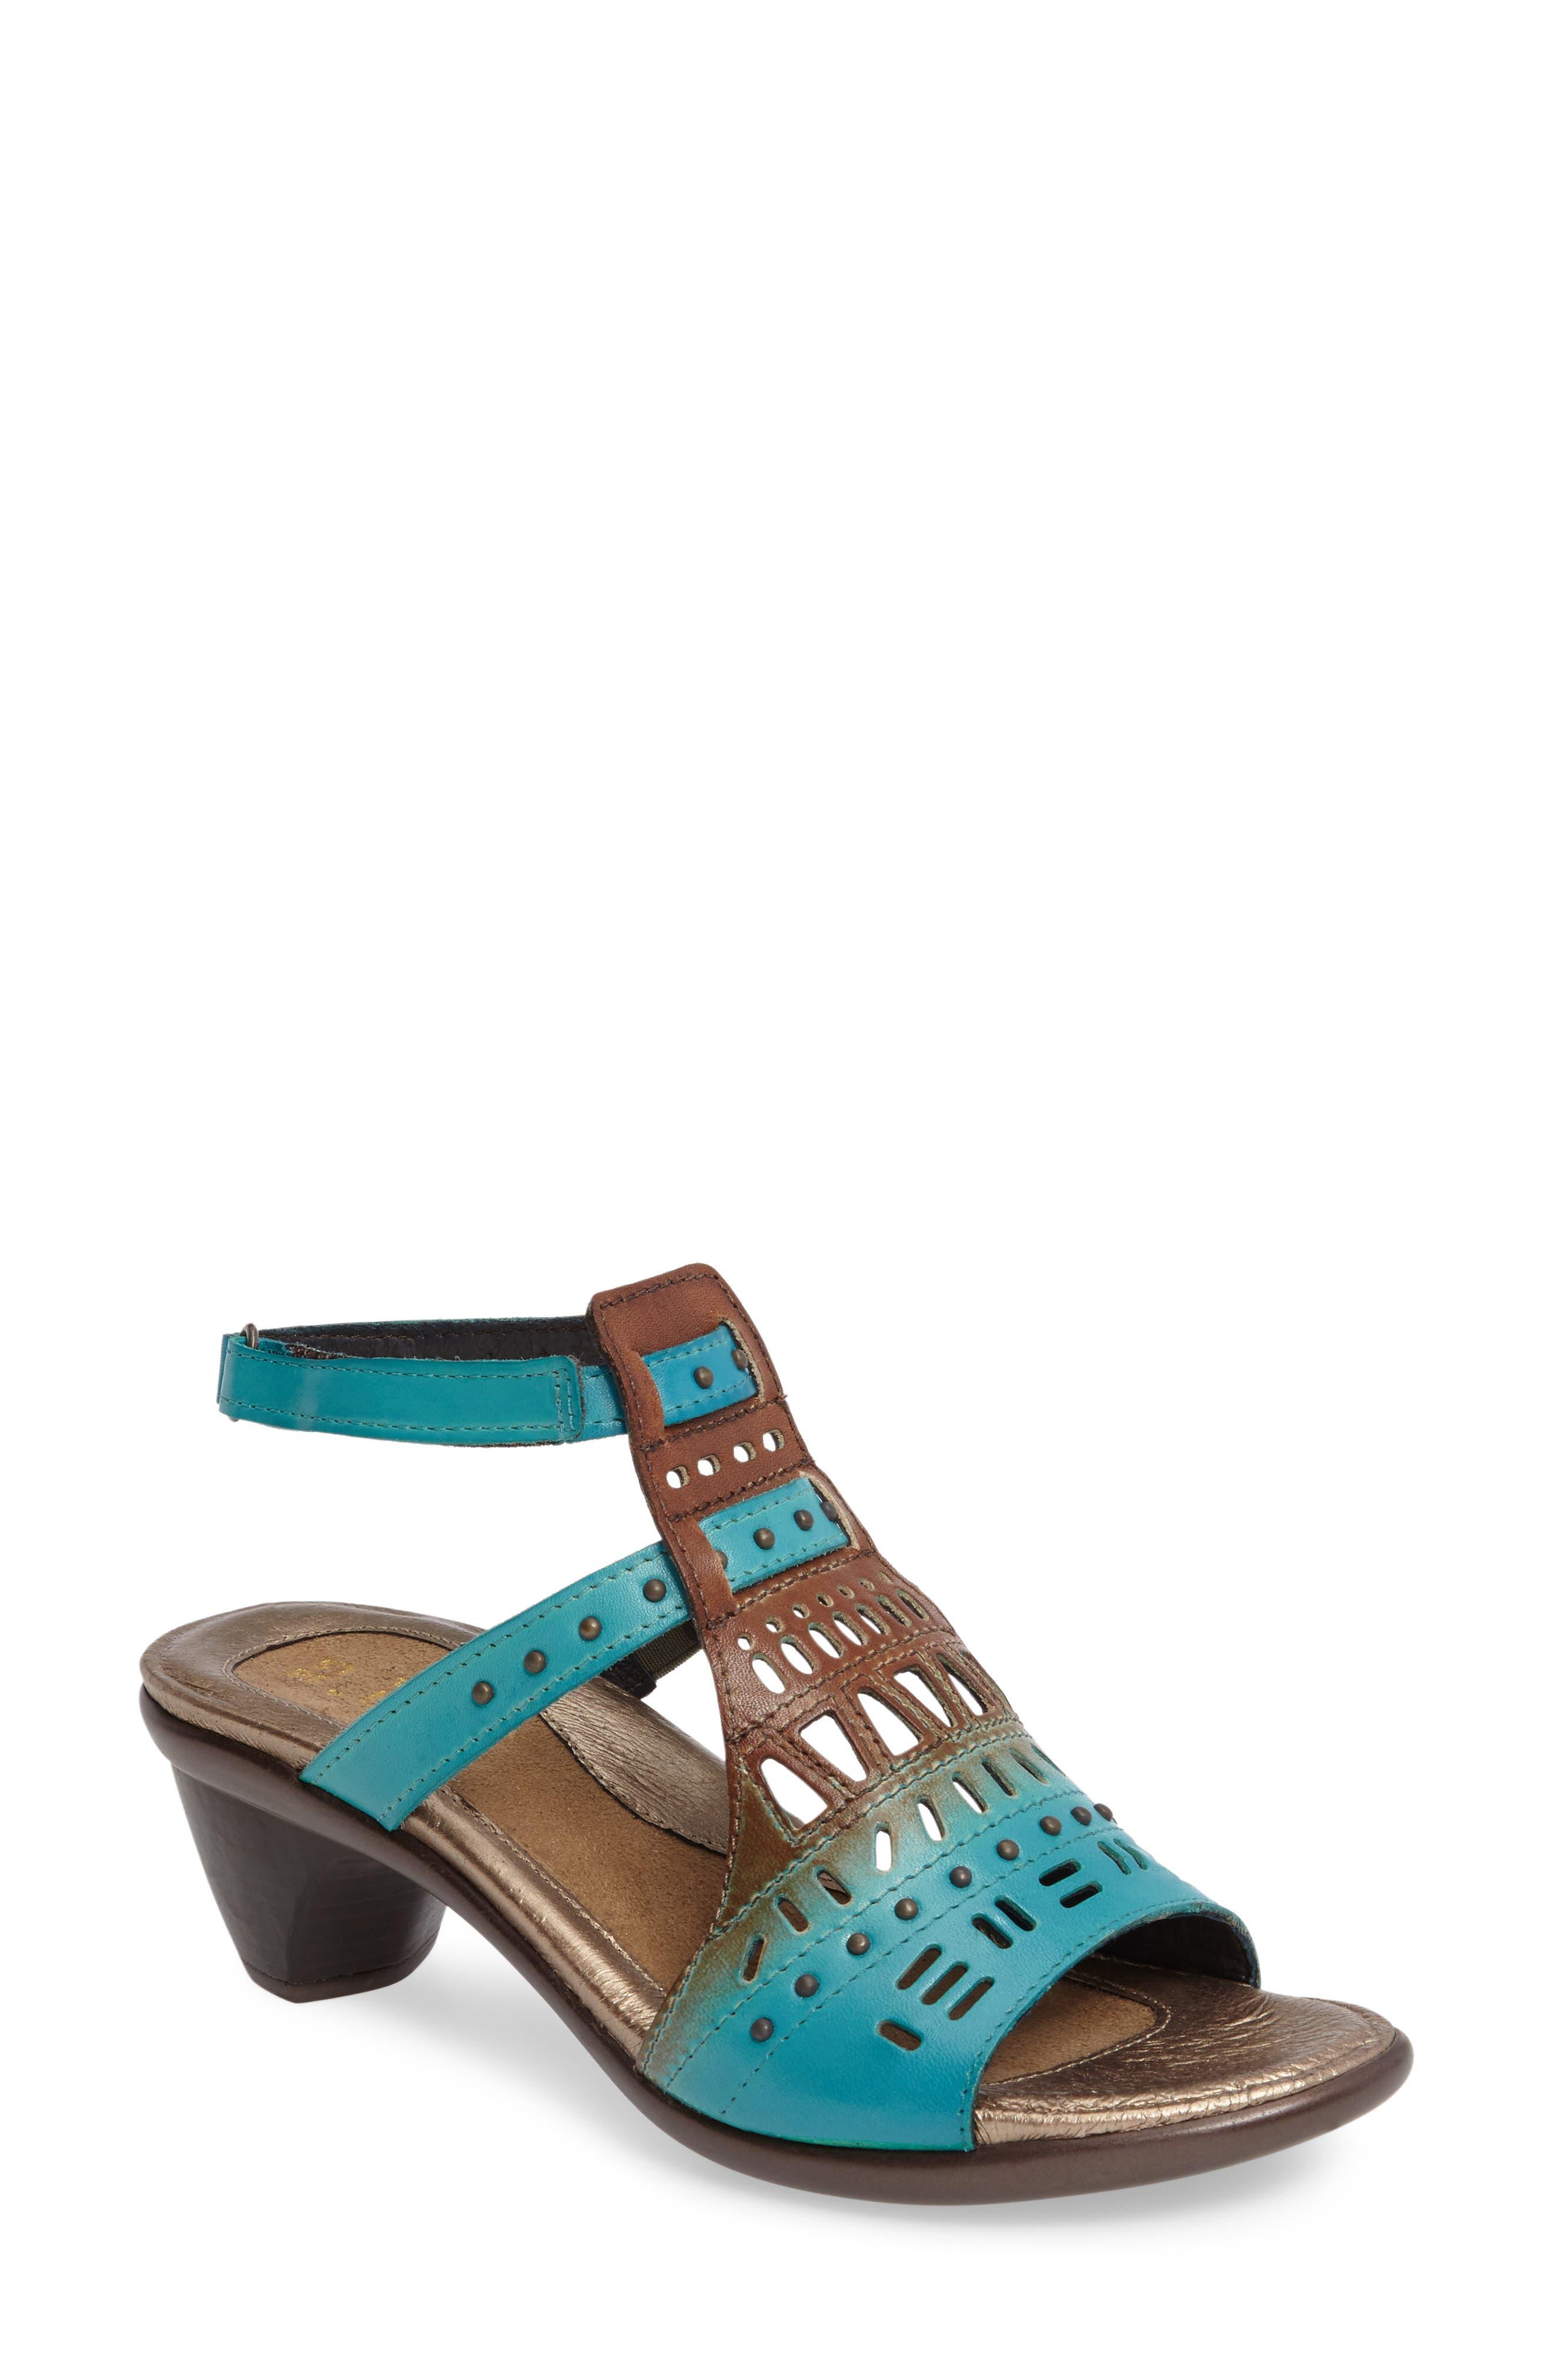 NAOT 'Vogue' Sandal, Main, color, TEAL BROWN LEATHER